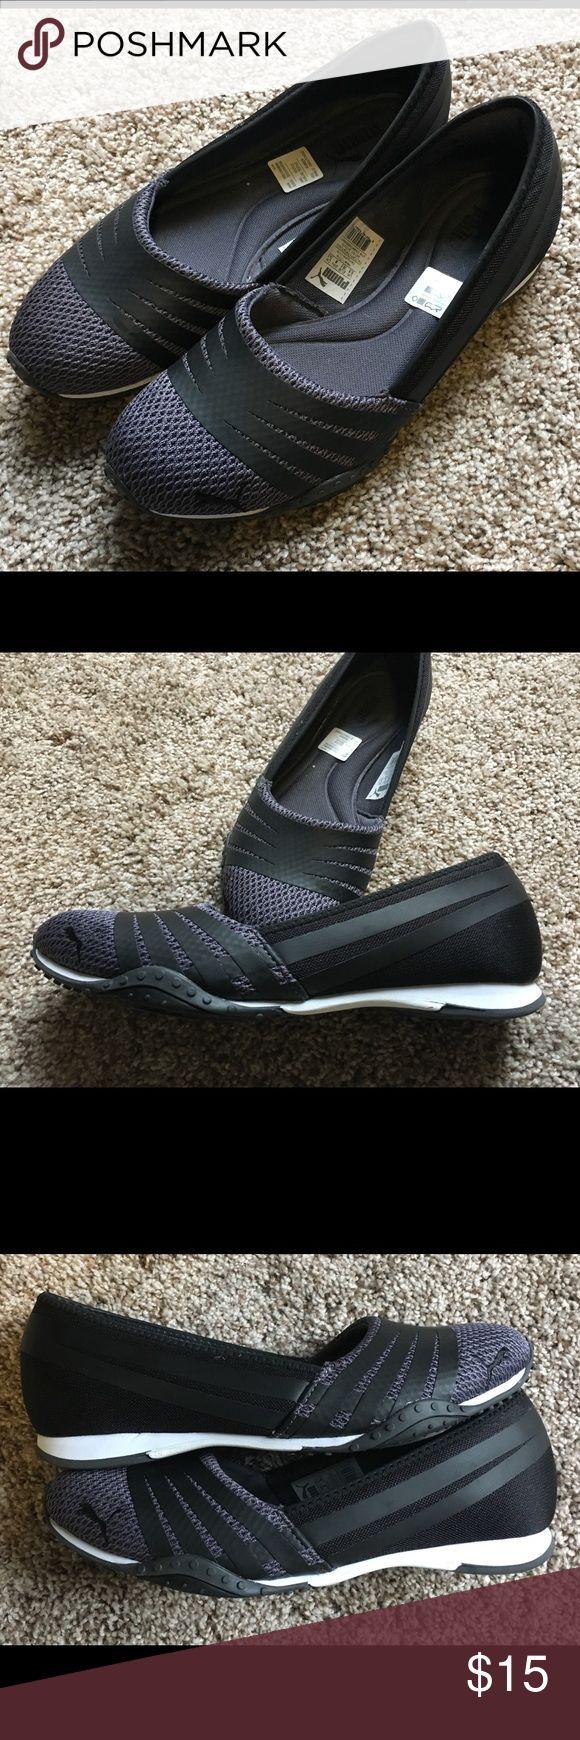 Puma Ballerina Flat Shoes Puma Ballerina Flats - Size 8 Puma Shoes Flats & Loafers